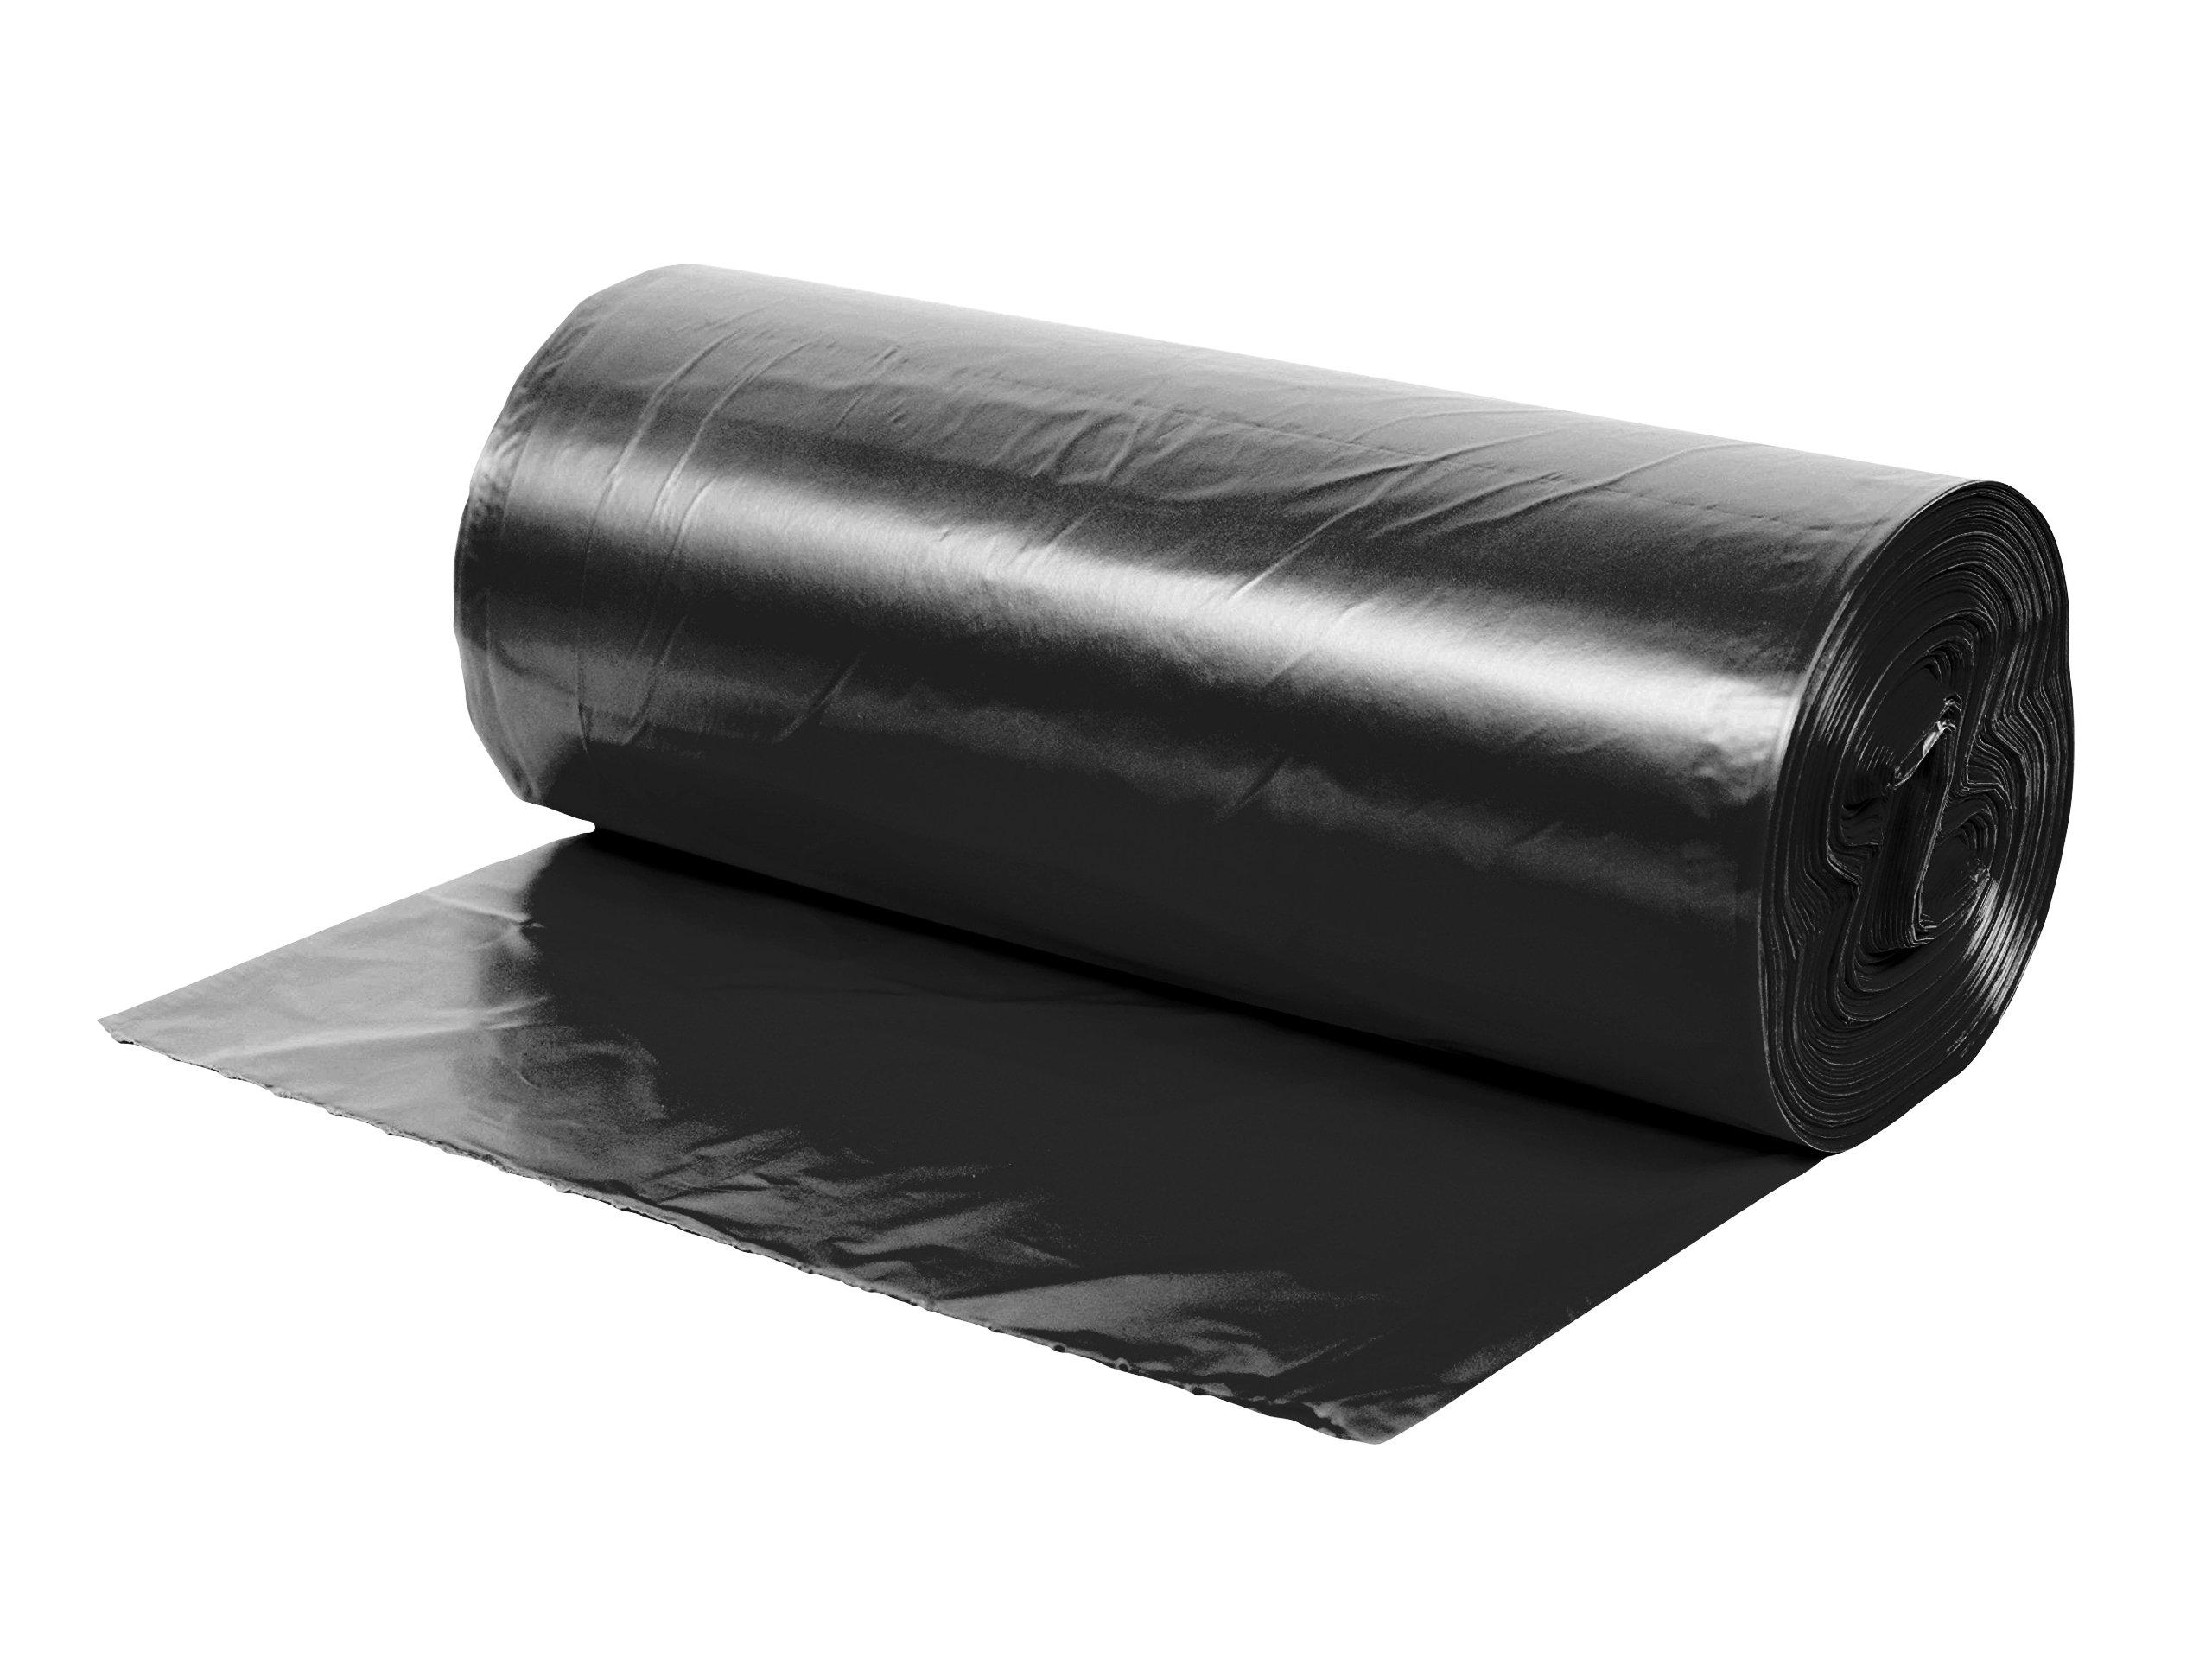 Siyah Endüstriyel Hantal Boy Çöp Torbası